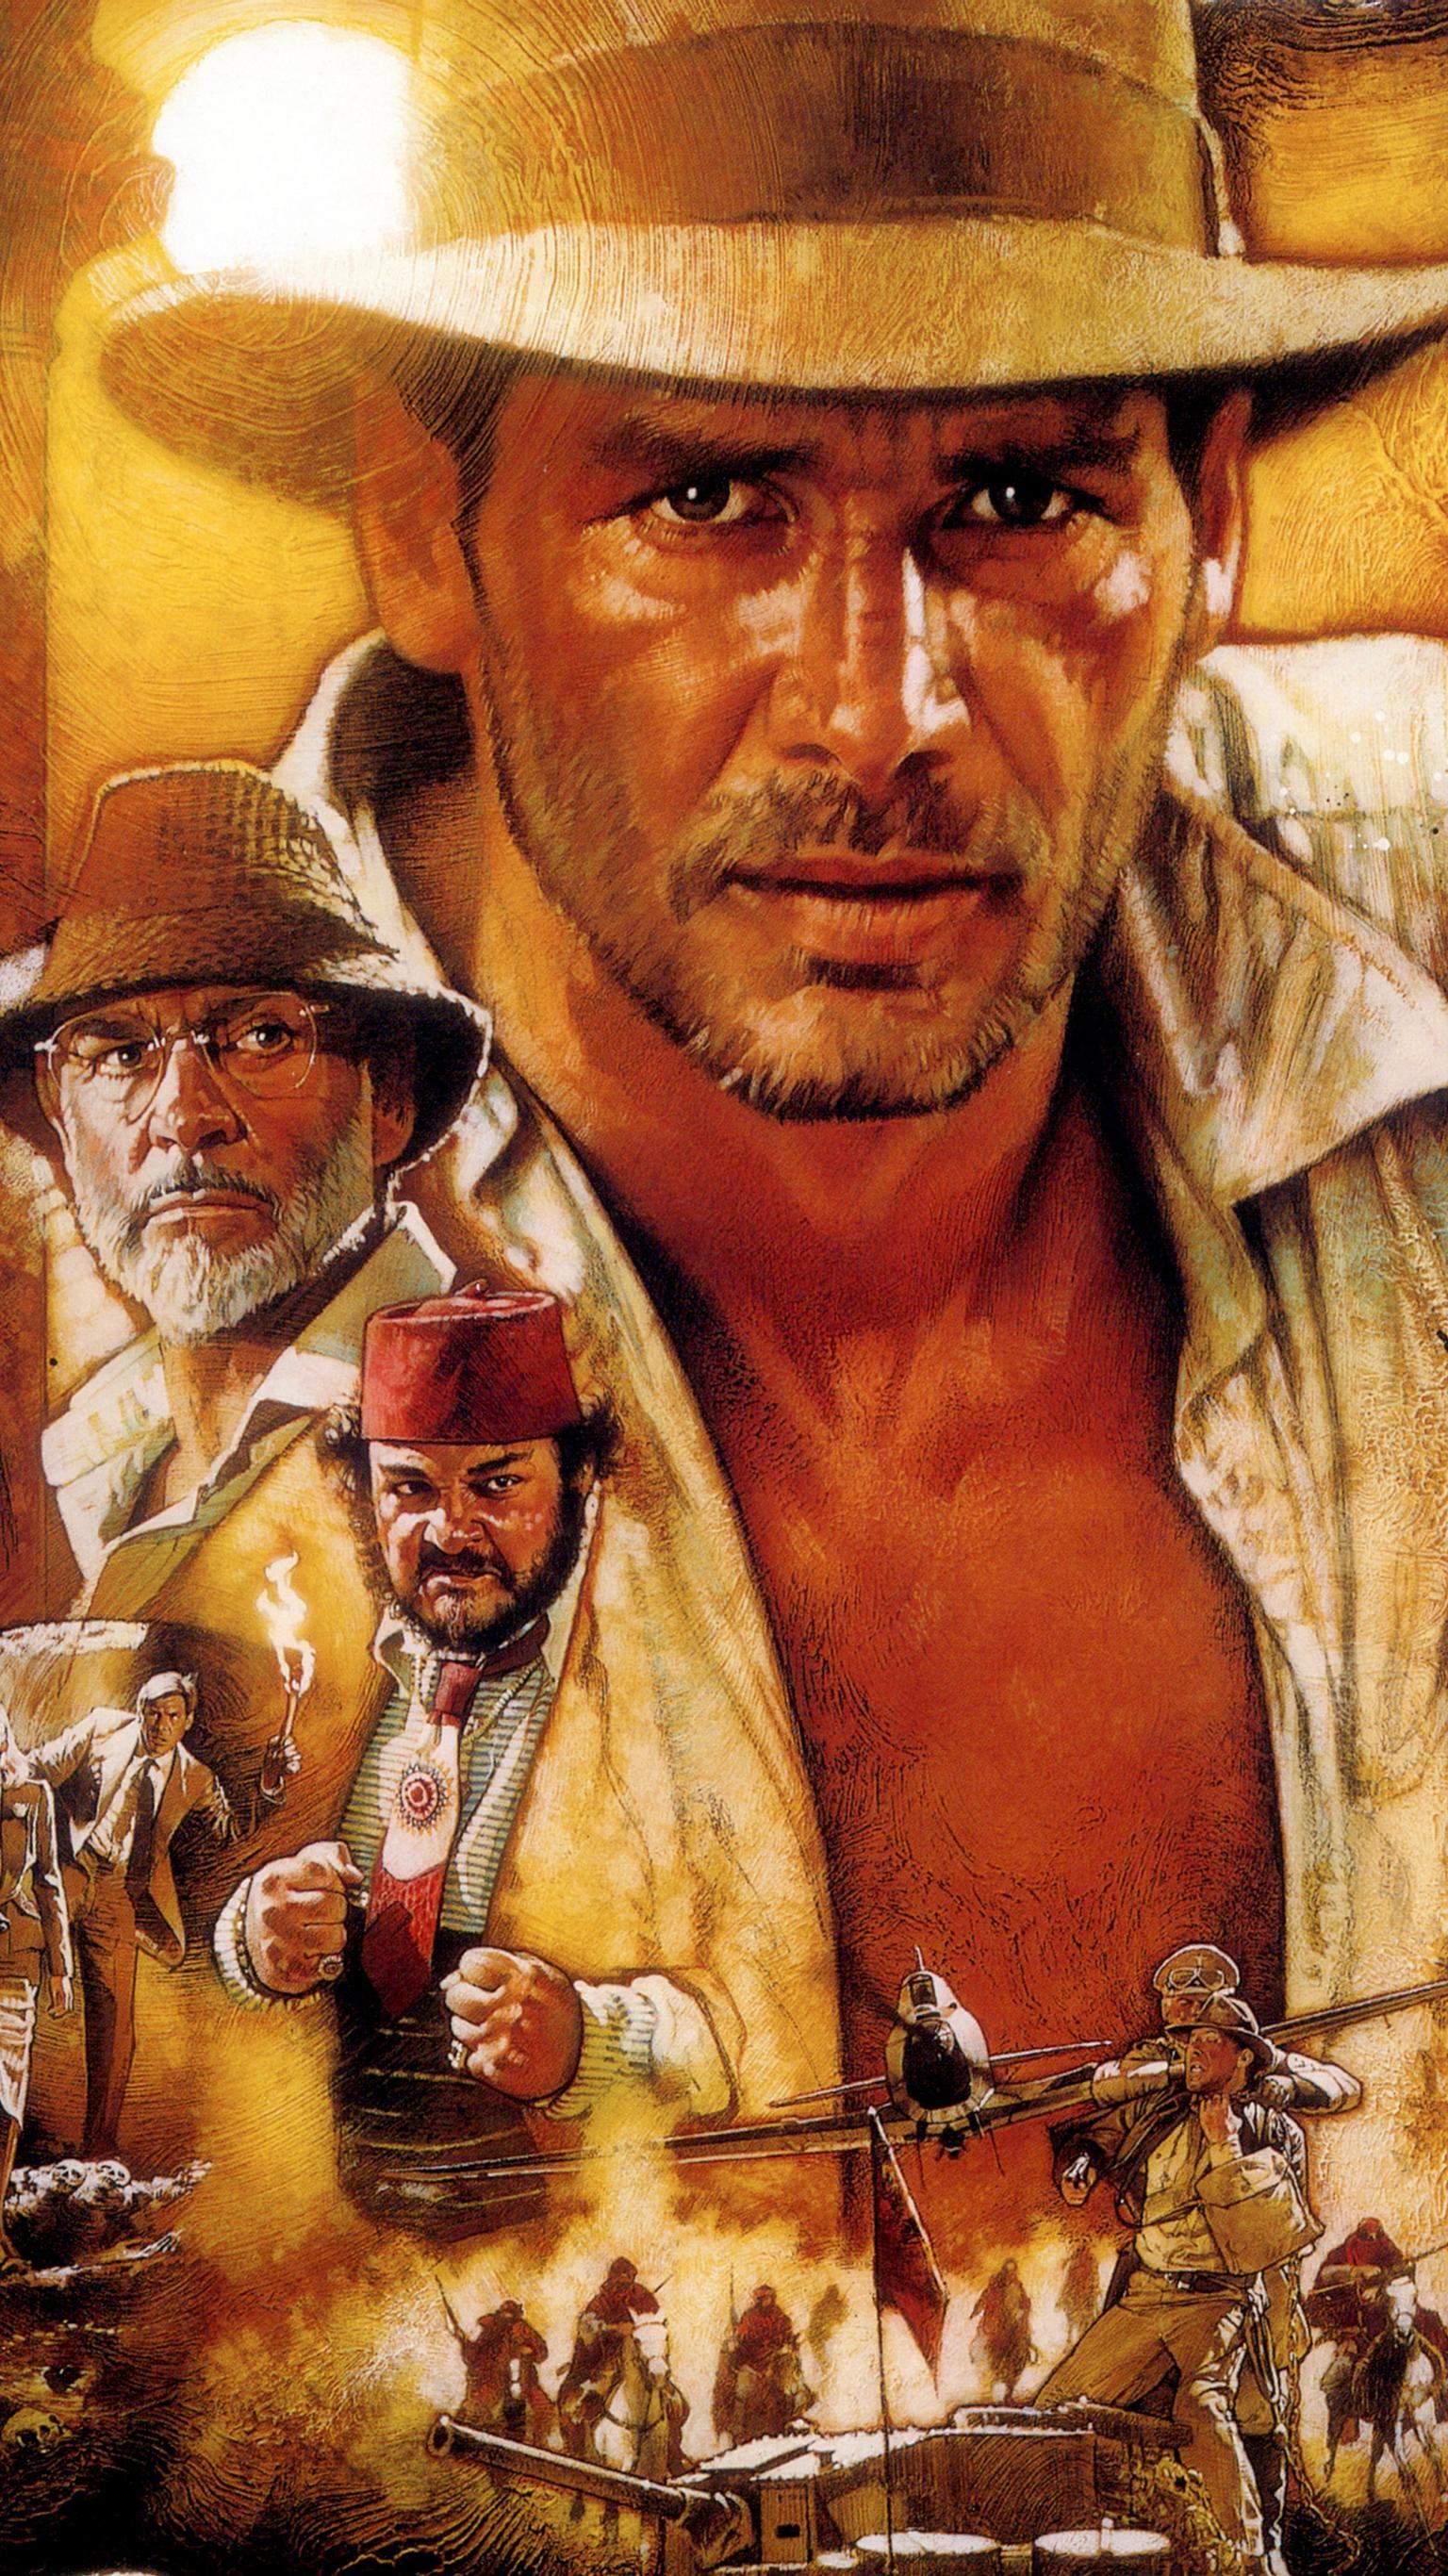 Indiana Jones and the Last Crusade (1989) Phone Wallpaper | Moviemania